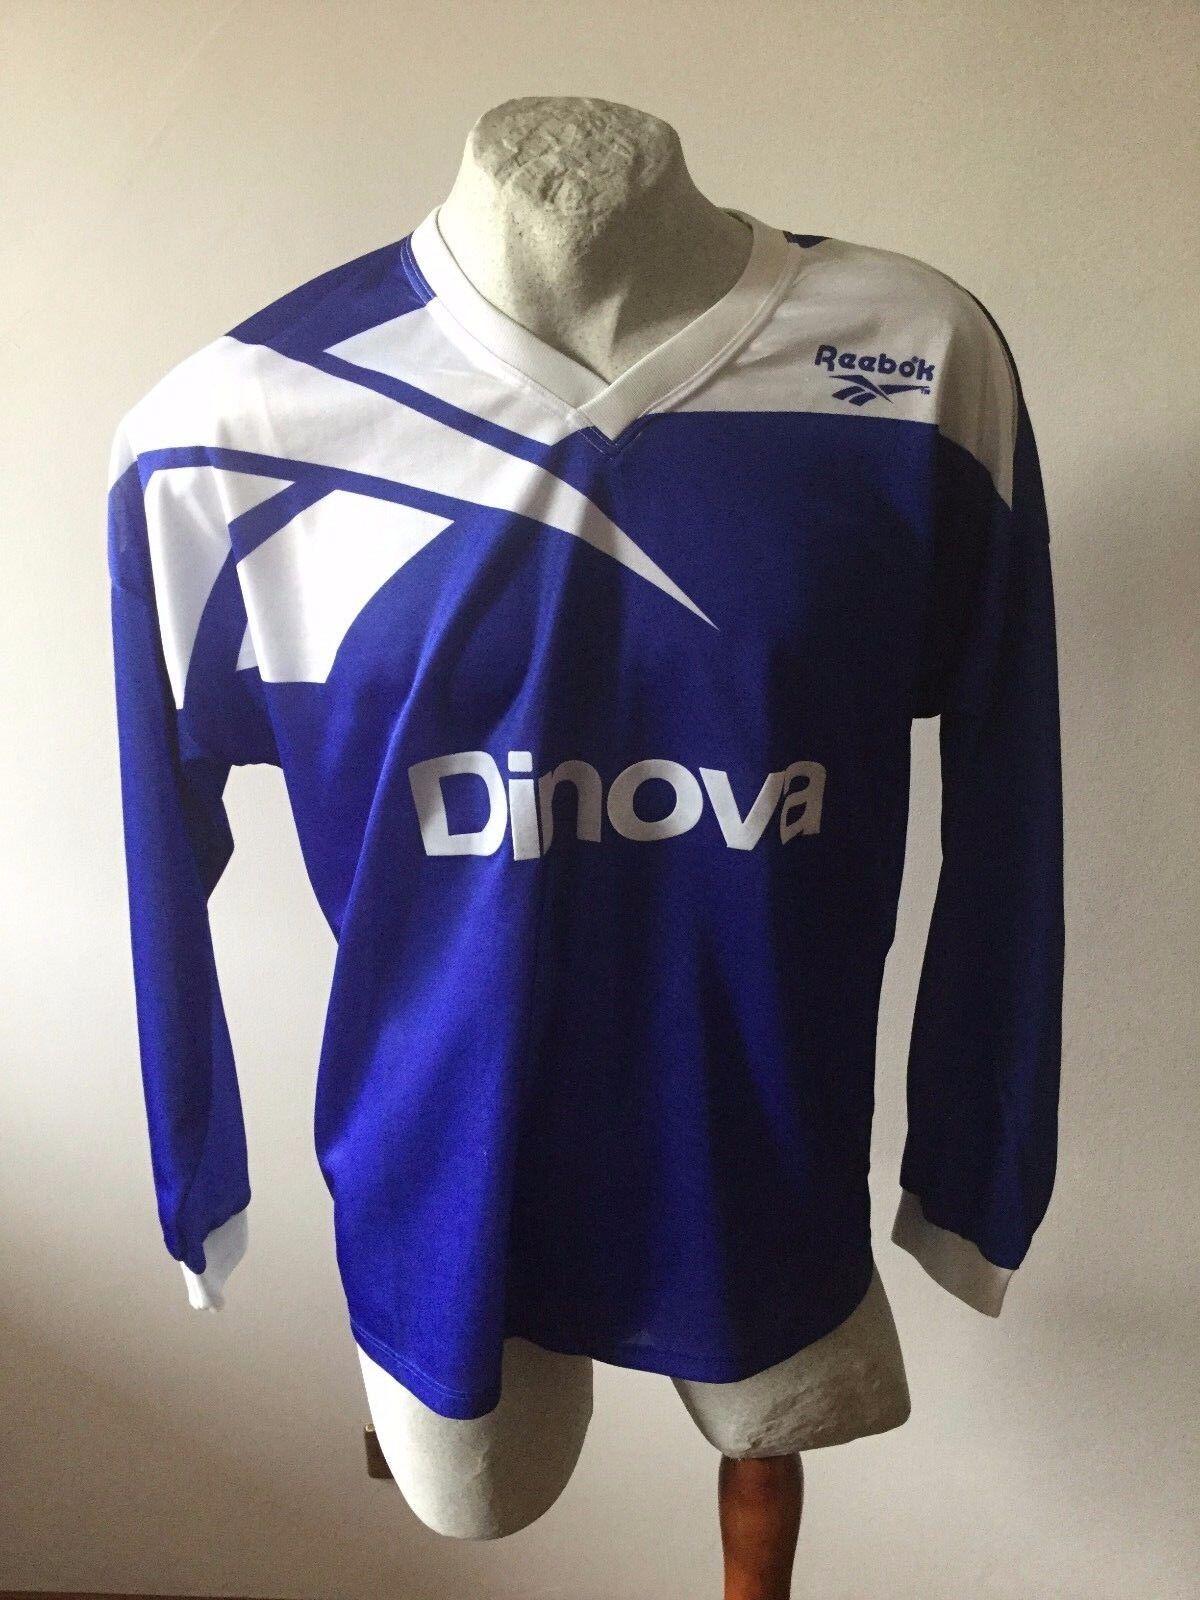 Alemannia dinova trikot maglia calcio reebok  jersey football shirt vintage